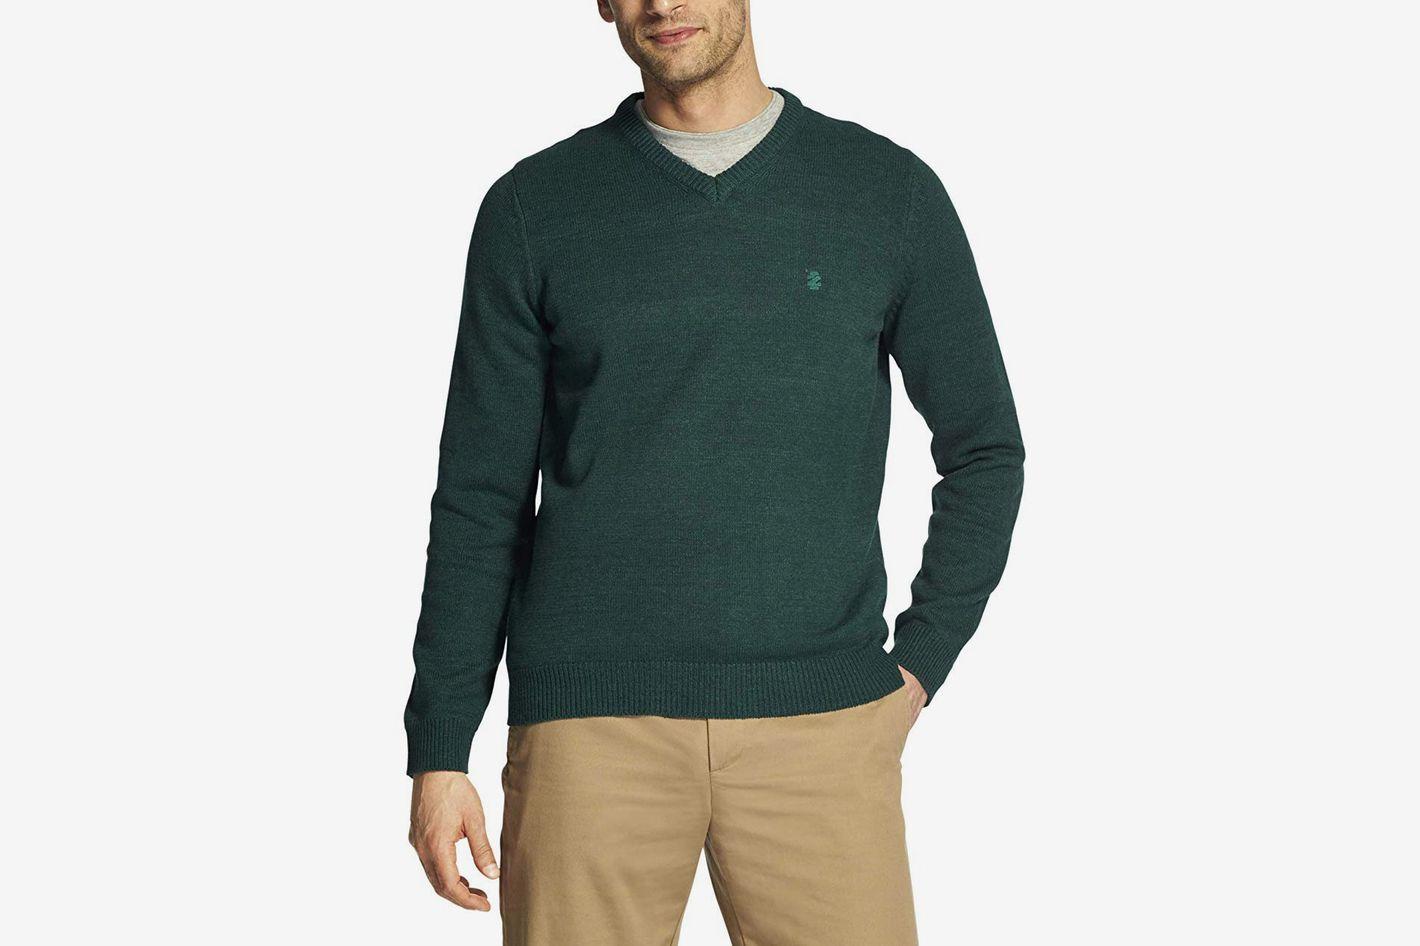 IZOD Men's Premium Essentials Fine Gauge Solid V-Neck Sweater